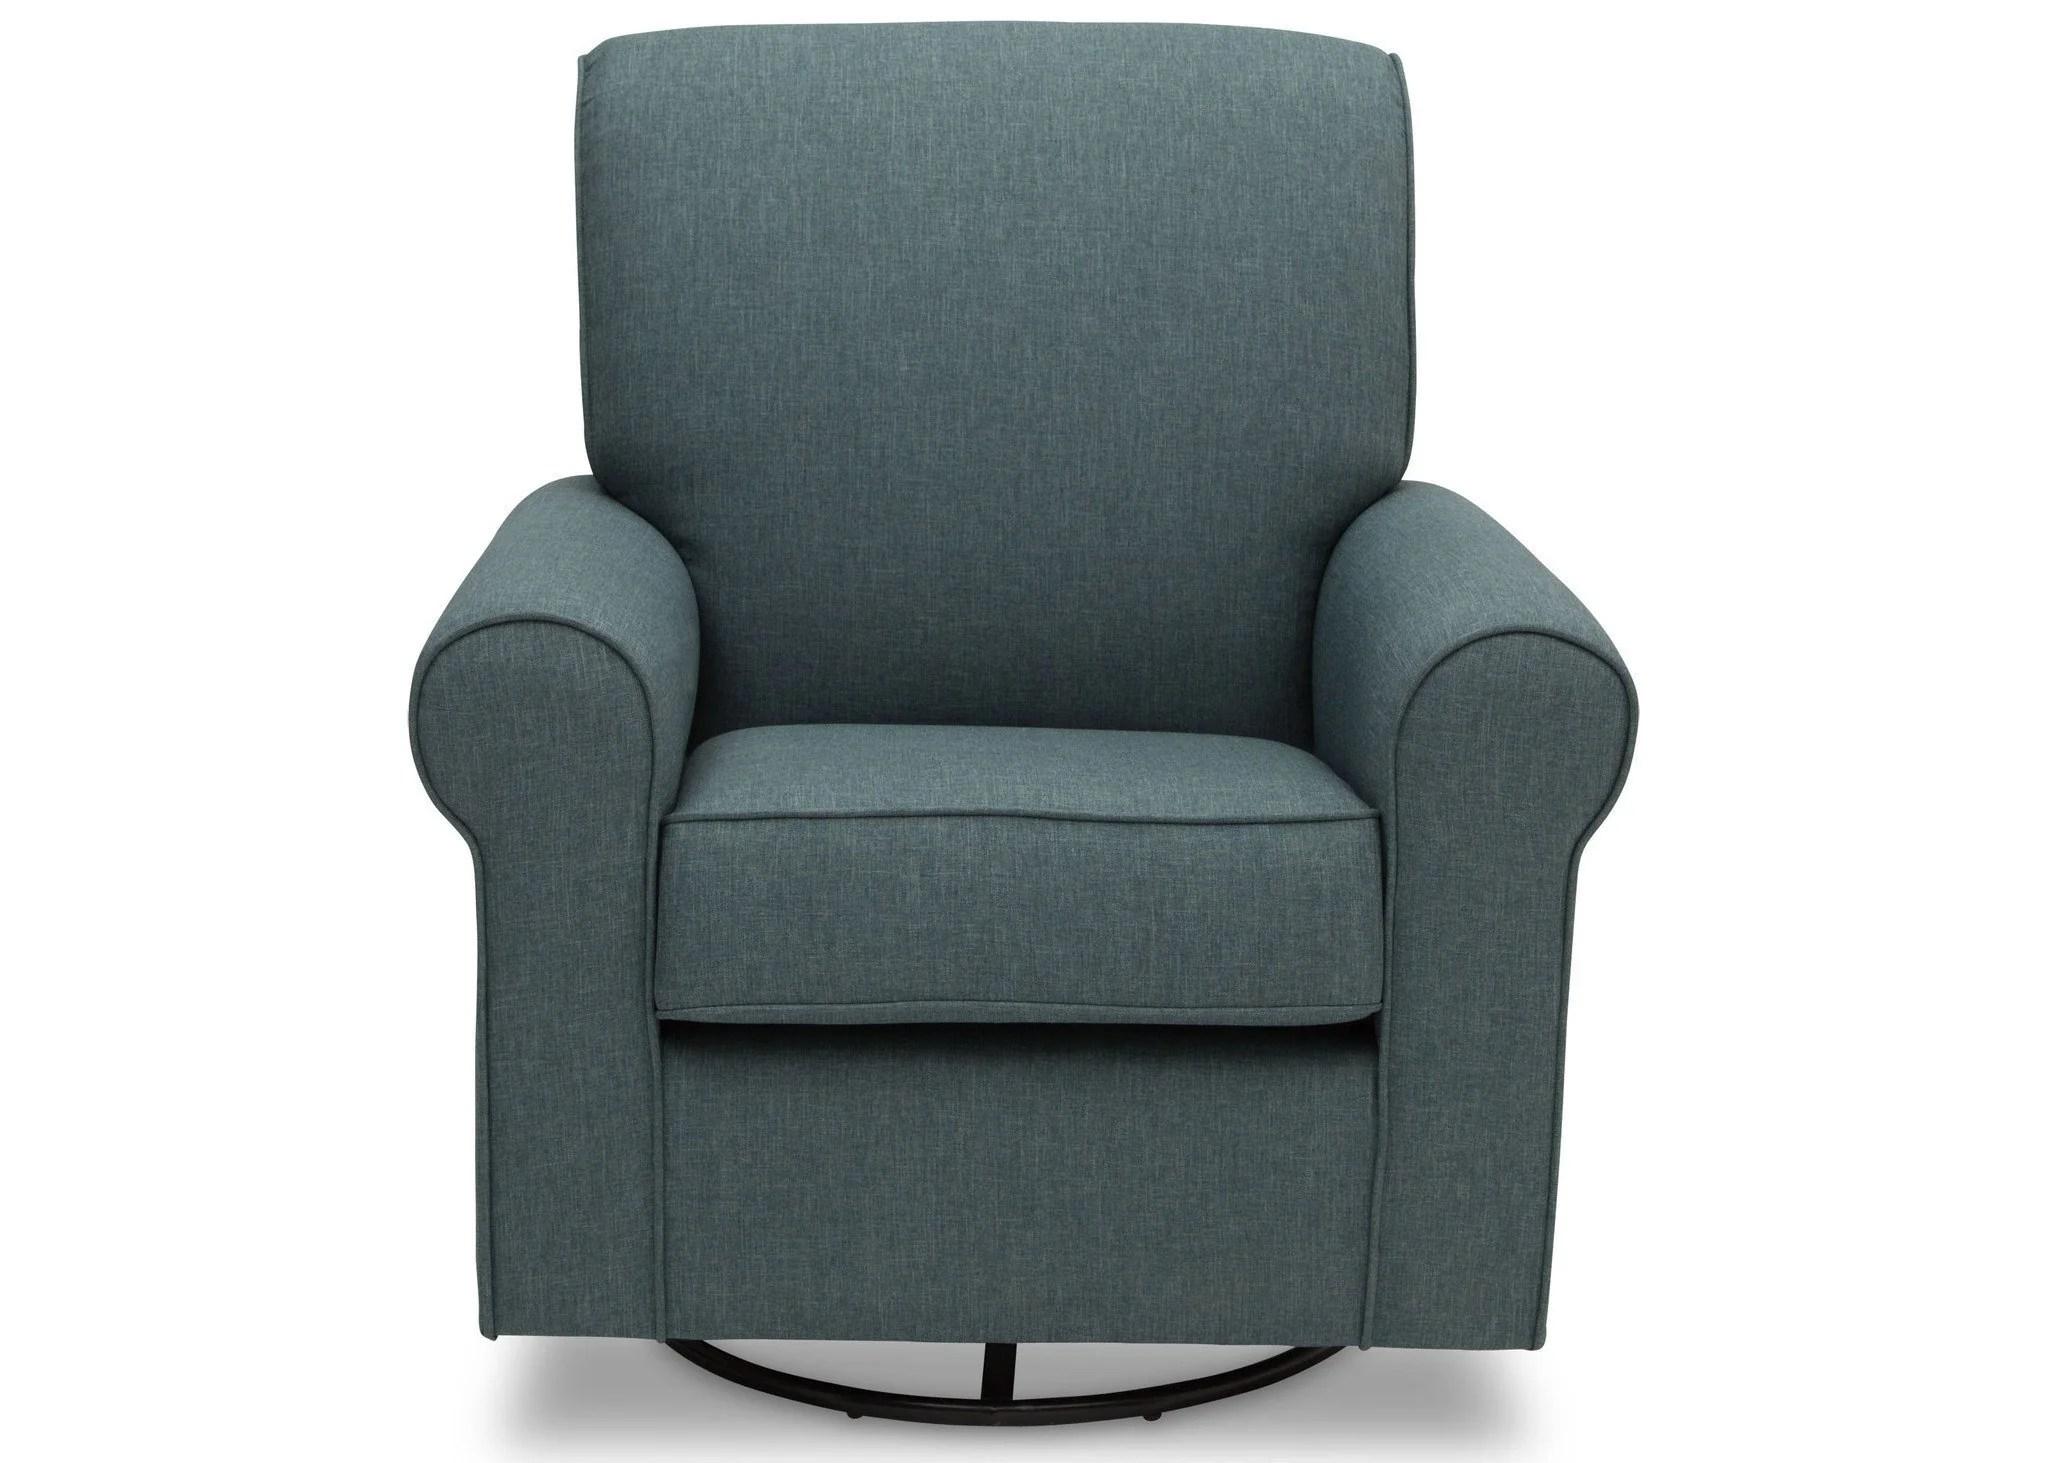 delta avery nursery glider chair grey modway office parts upholstered children